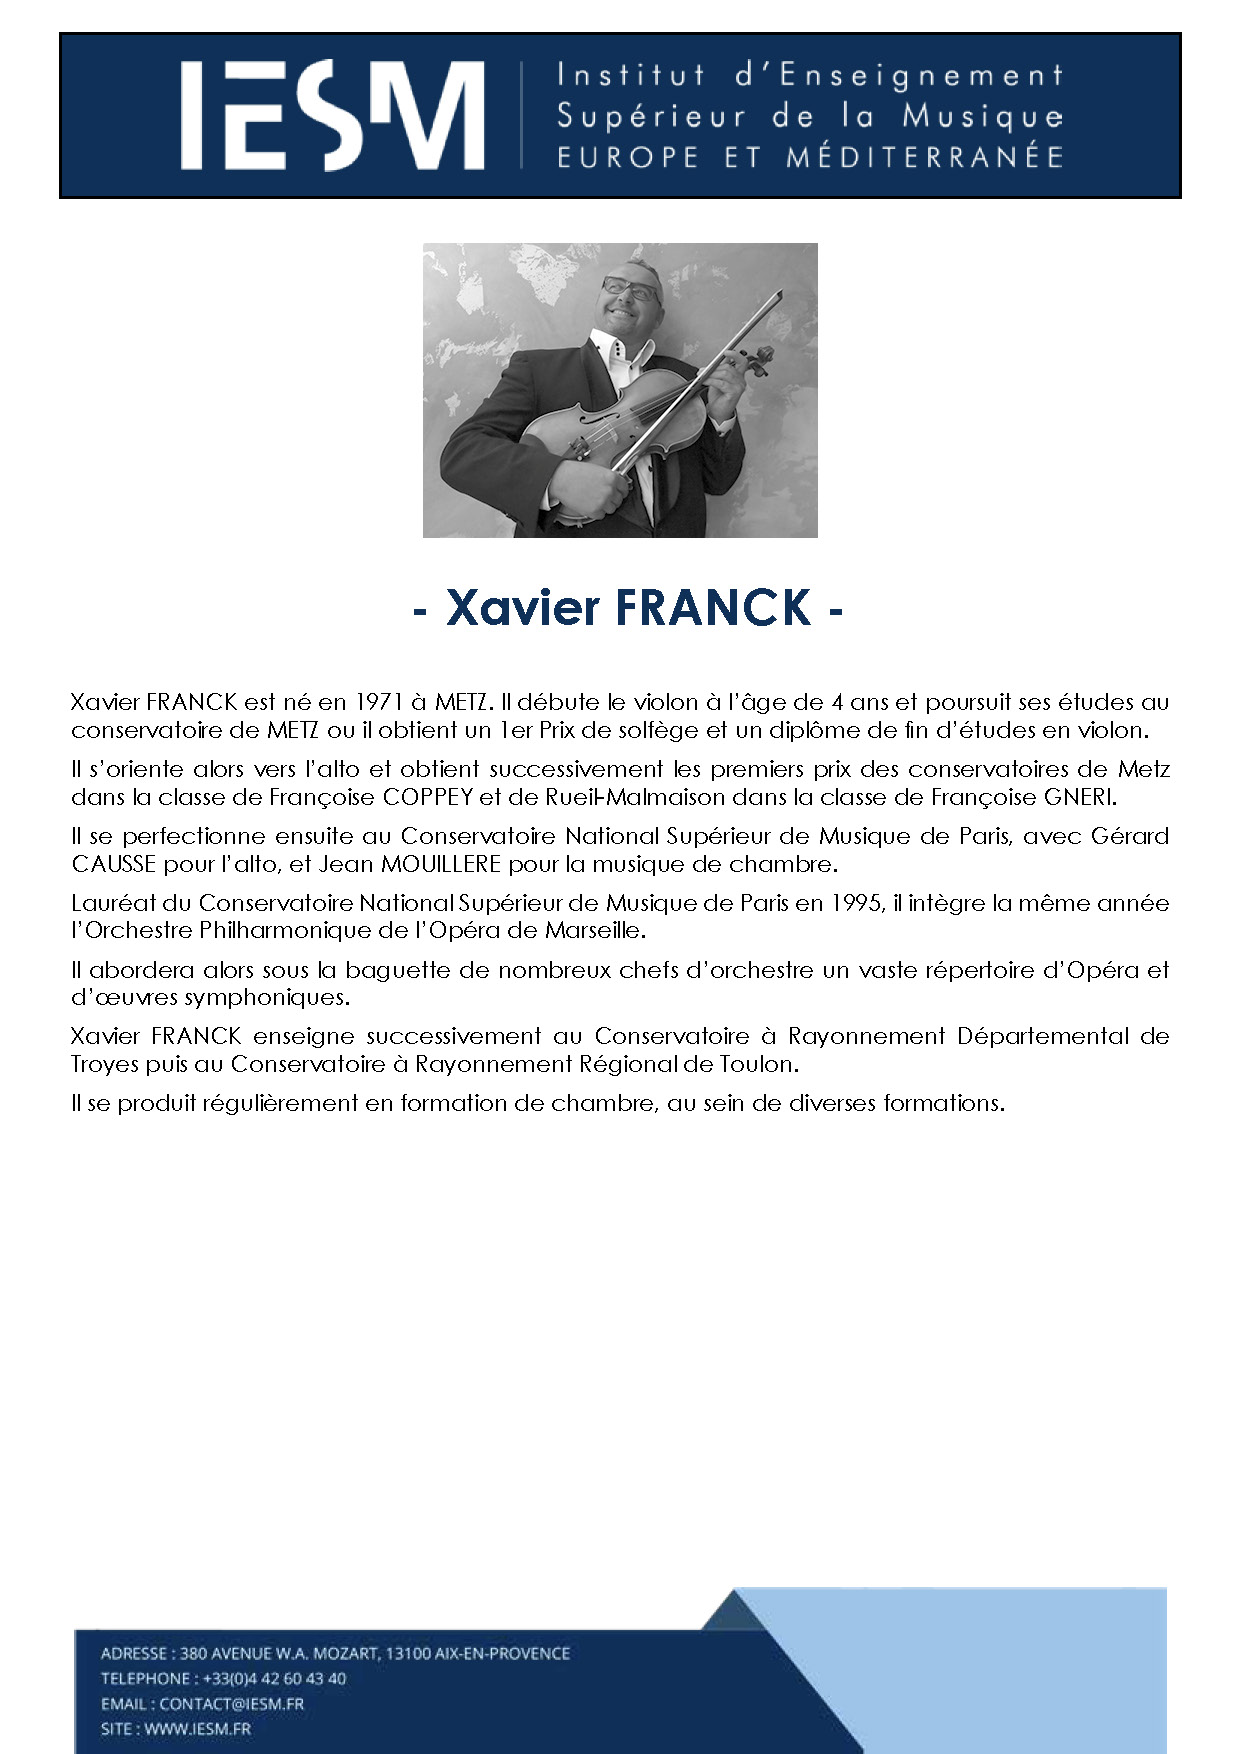 FRANC XAVIERFRANCK